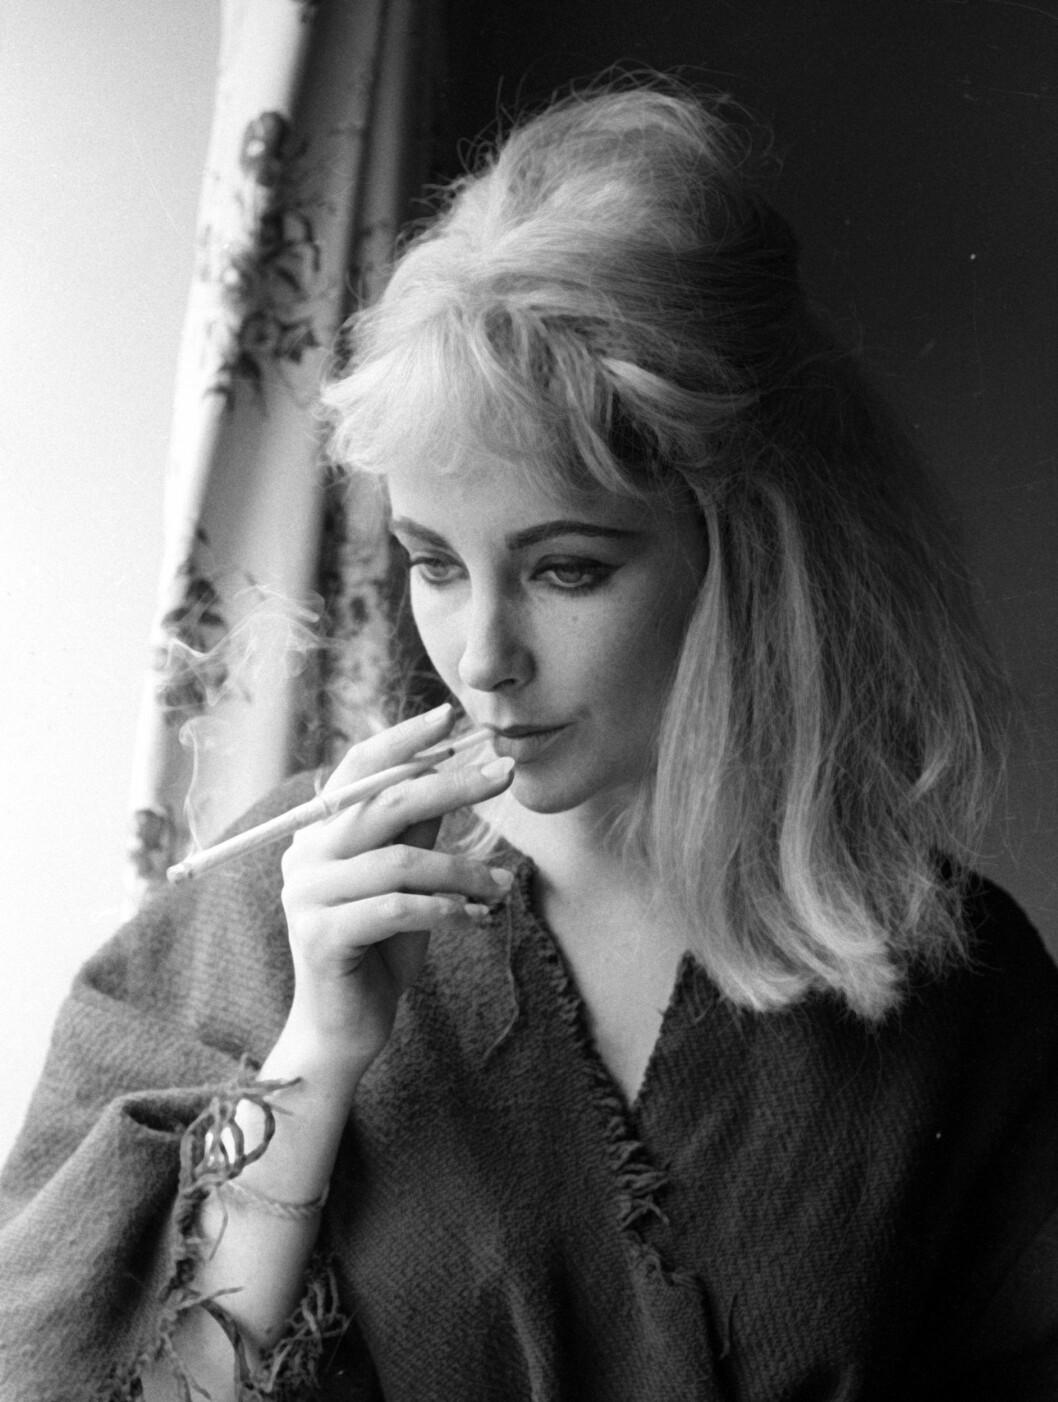 <strong>1963:</strong> Elizabeth Taylo med en sigarett på 60-tallet.  Foto: All Over Press